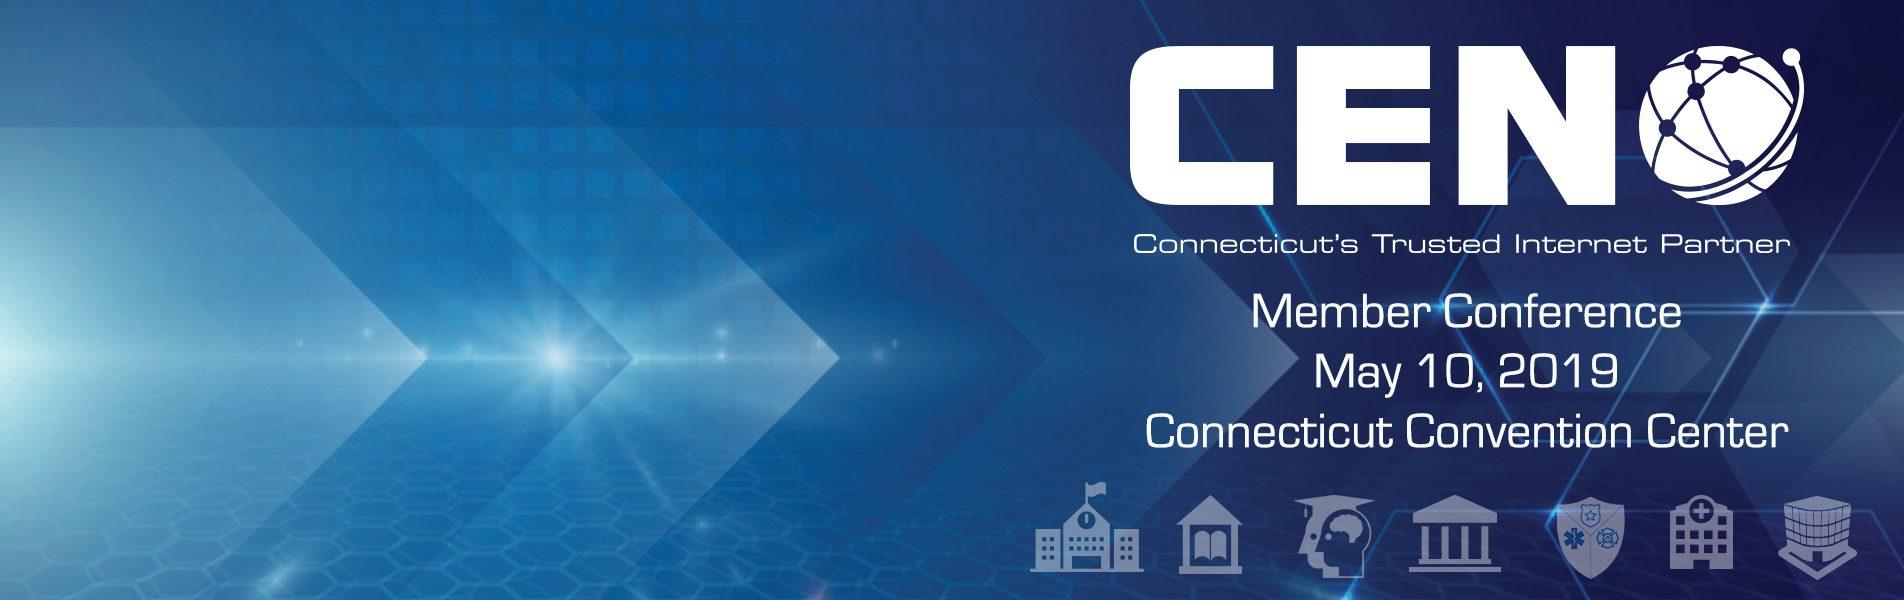 cen conference logo